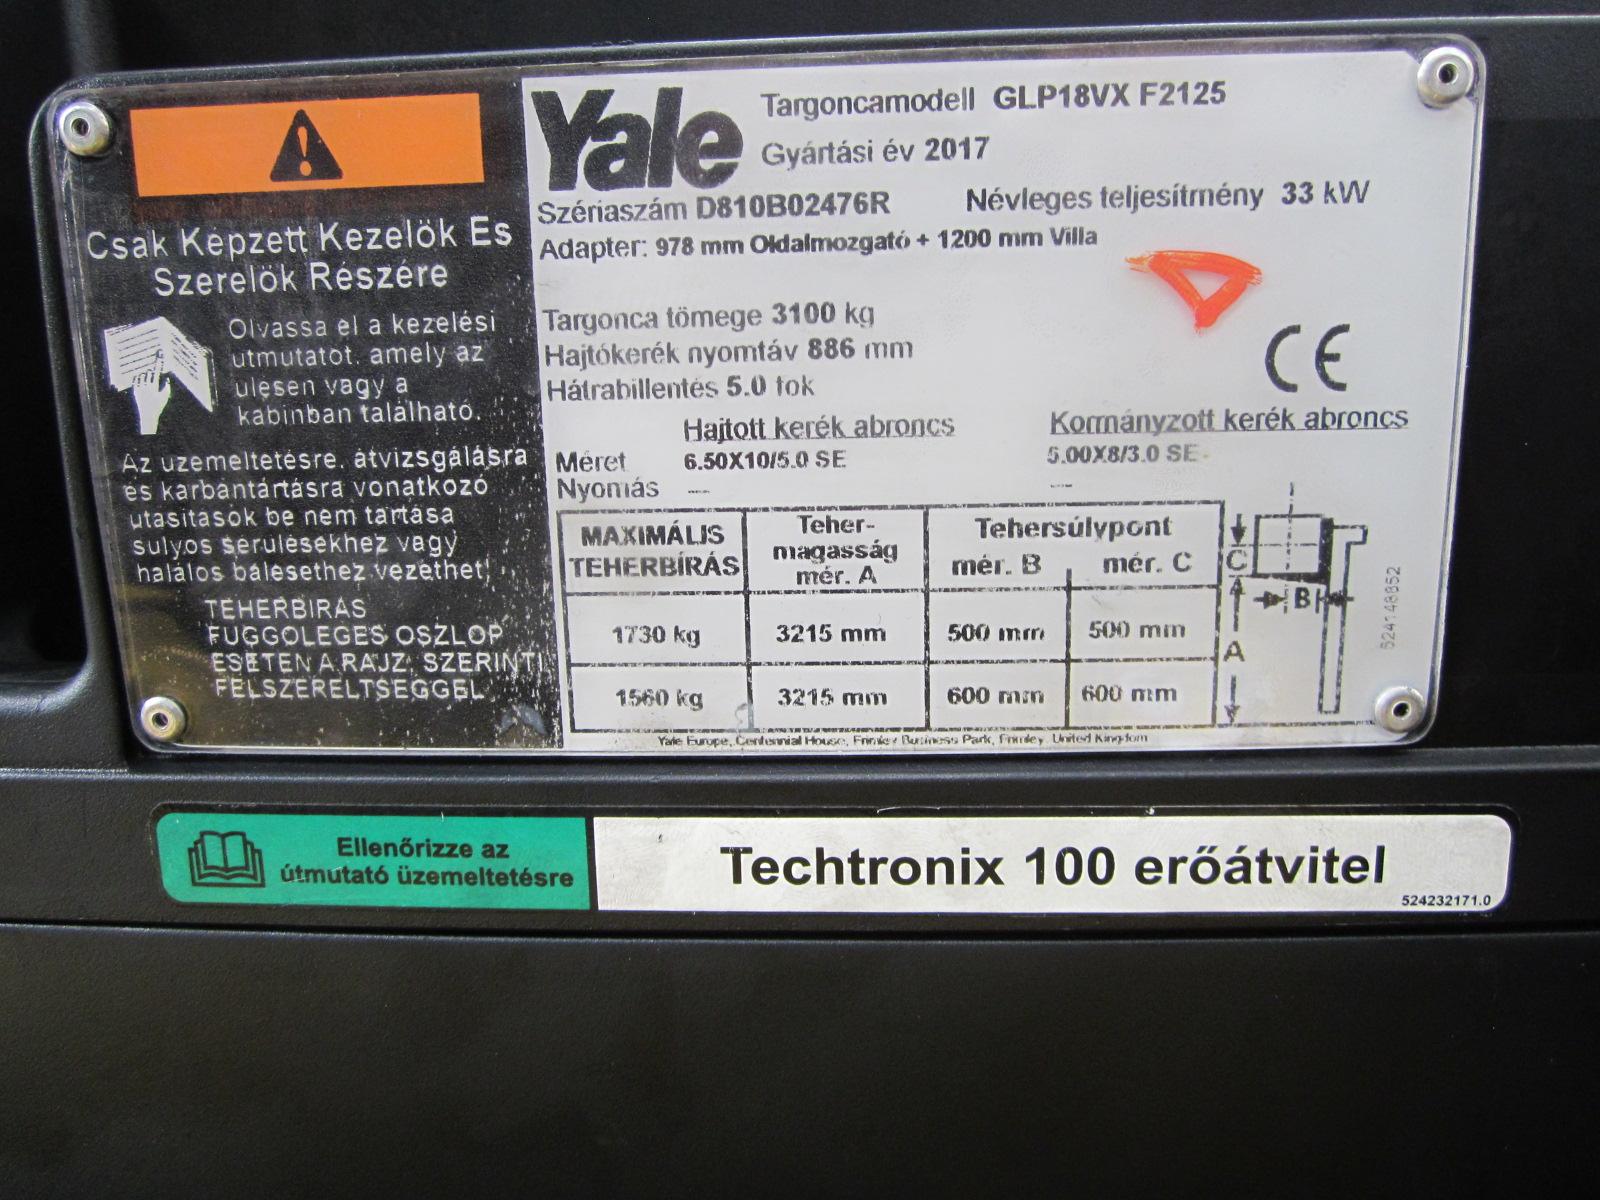 Yale GLP18VX PG2183207 targonca2